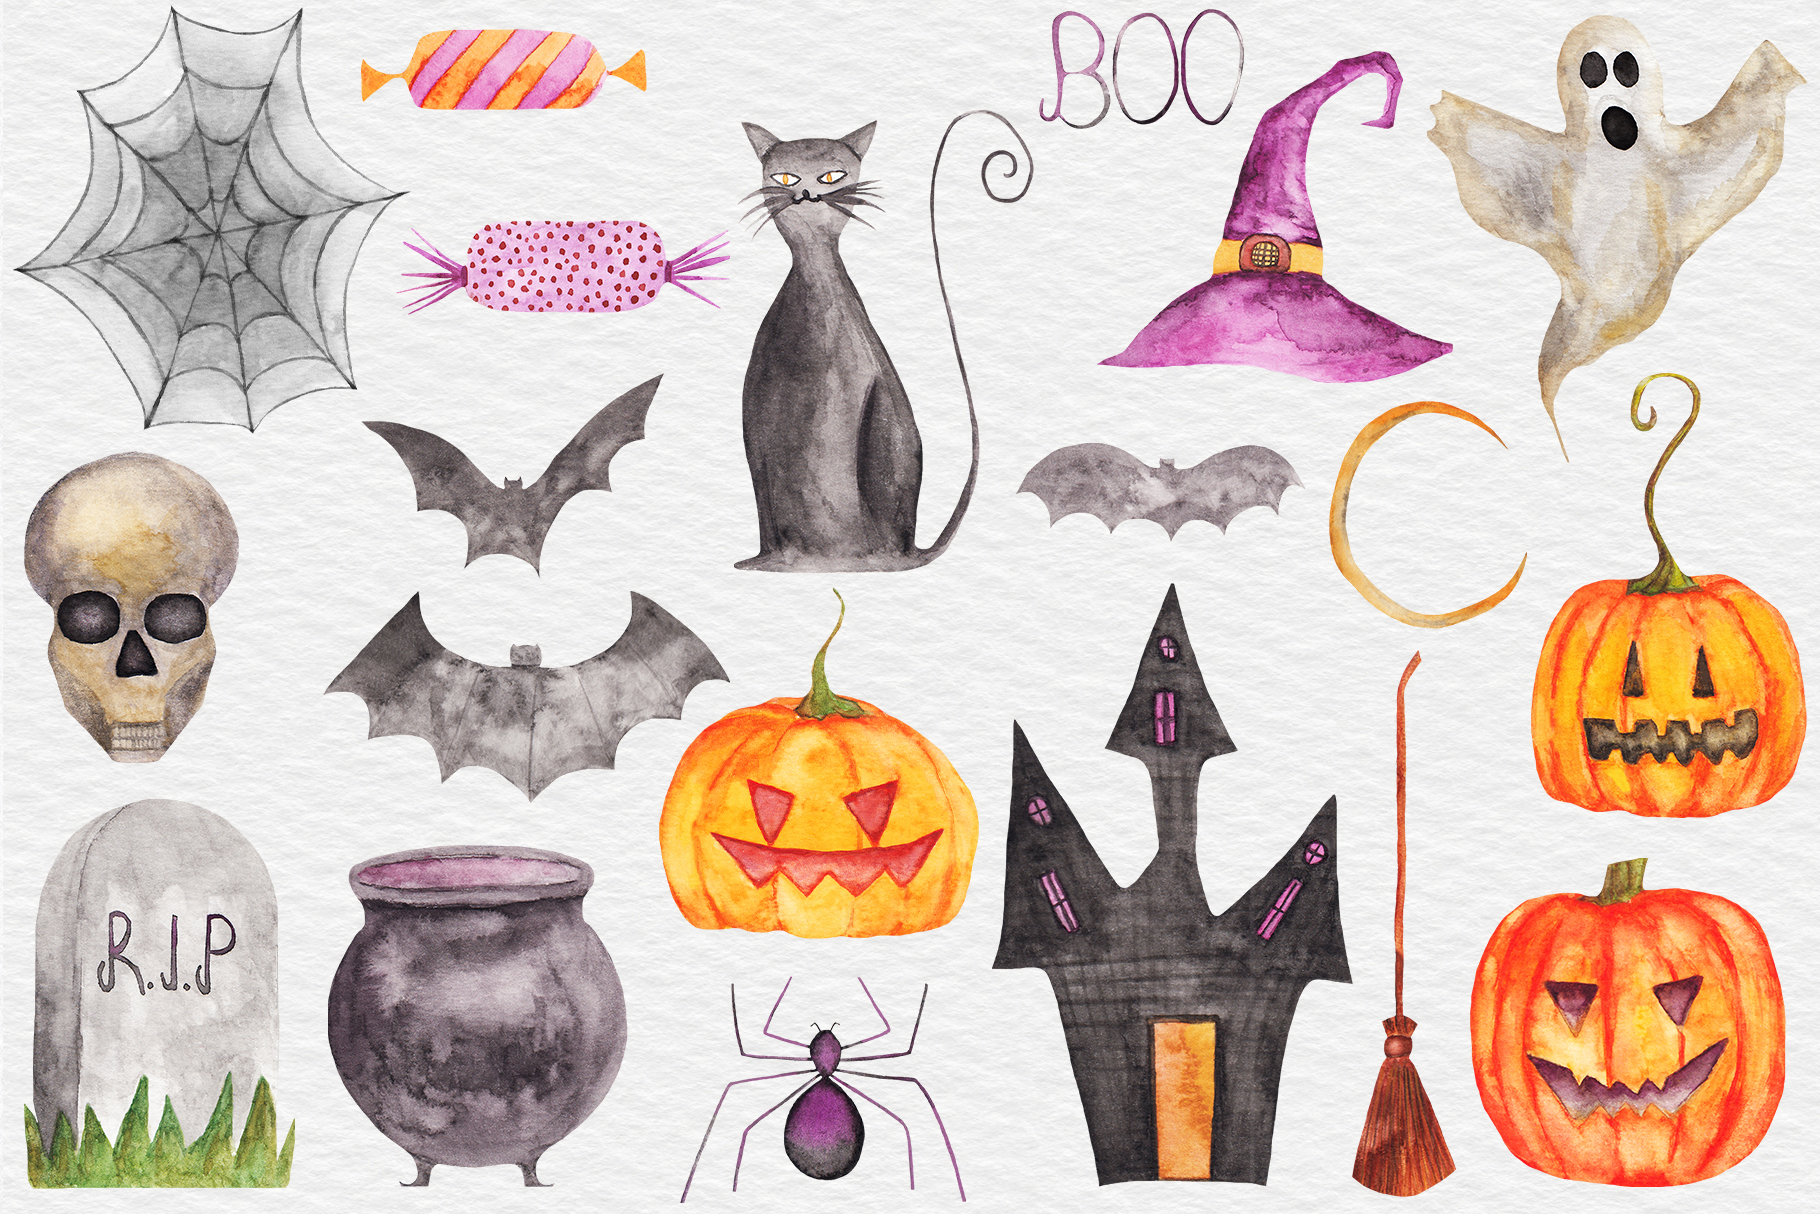 Watercolor Halloween Clipart, Pumpkin, Fall Autumn Clipart example image 2